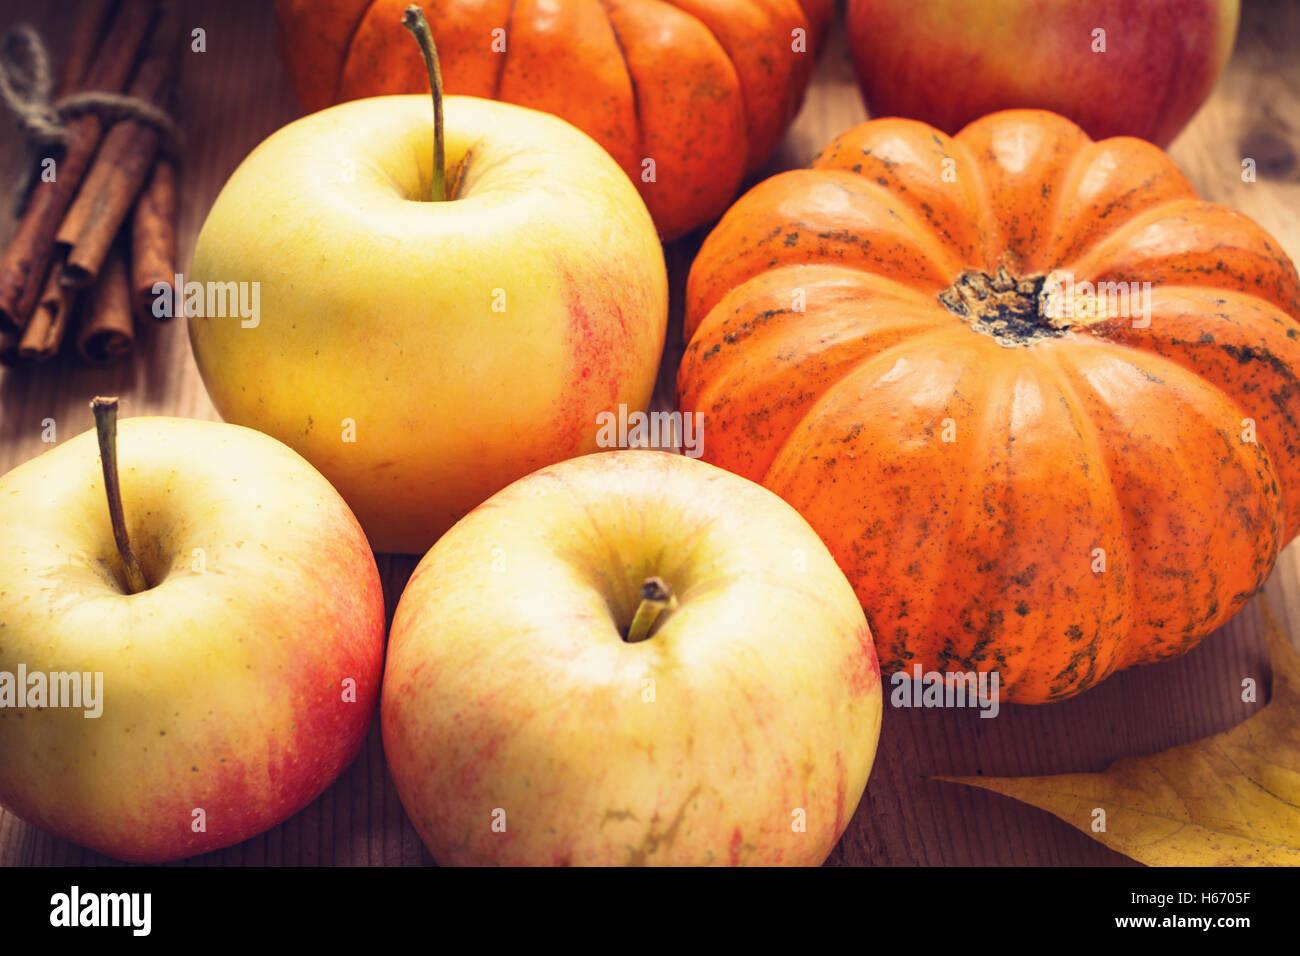 Autumn harvest: apples, pumpkins and bunch of cinnamon sticks on wooden table. Seasonal harvest. Toned image Stock Photo